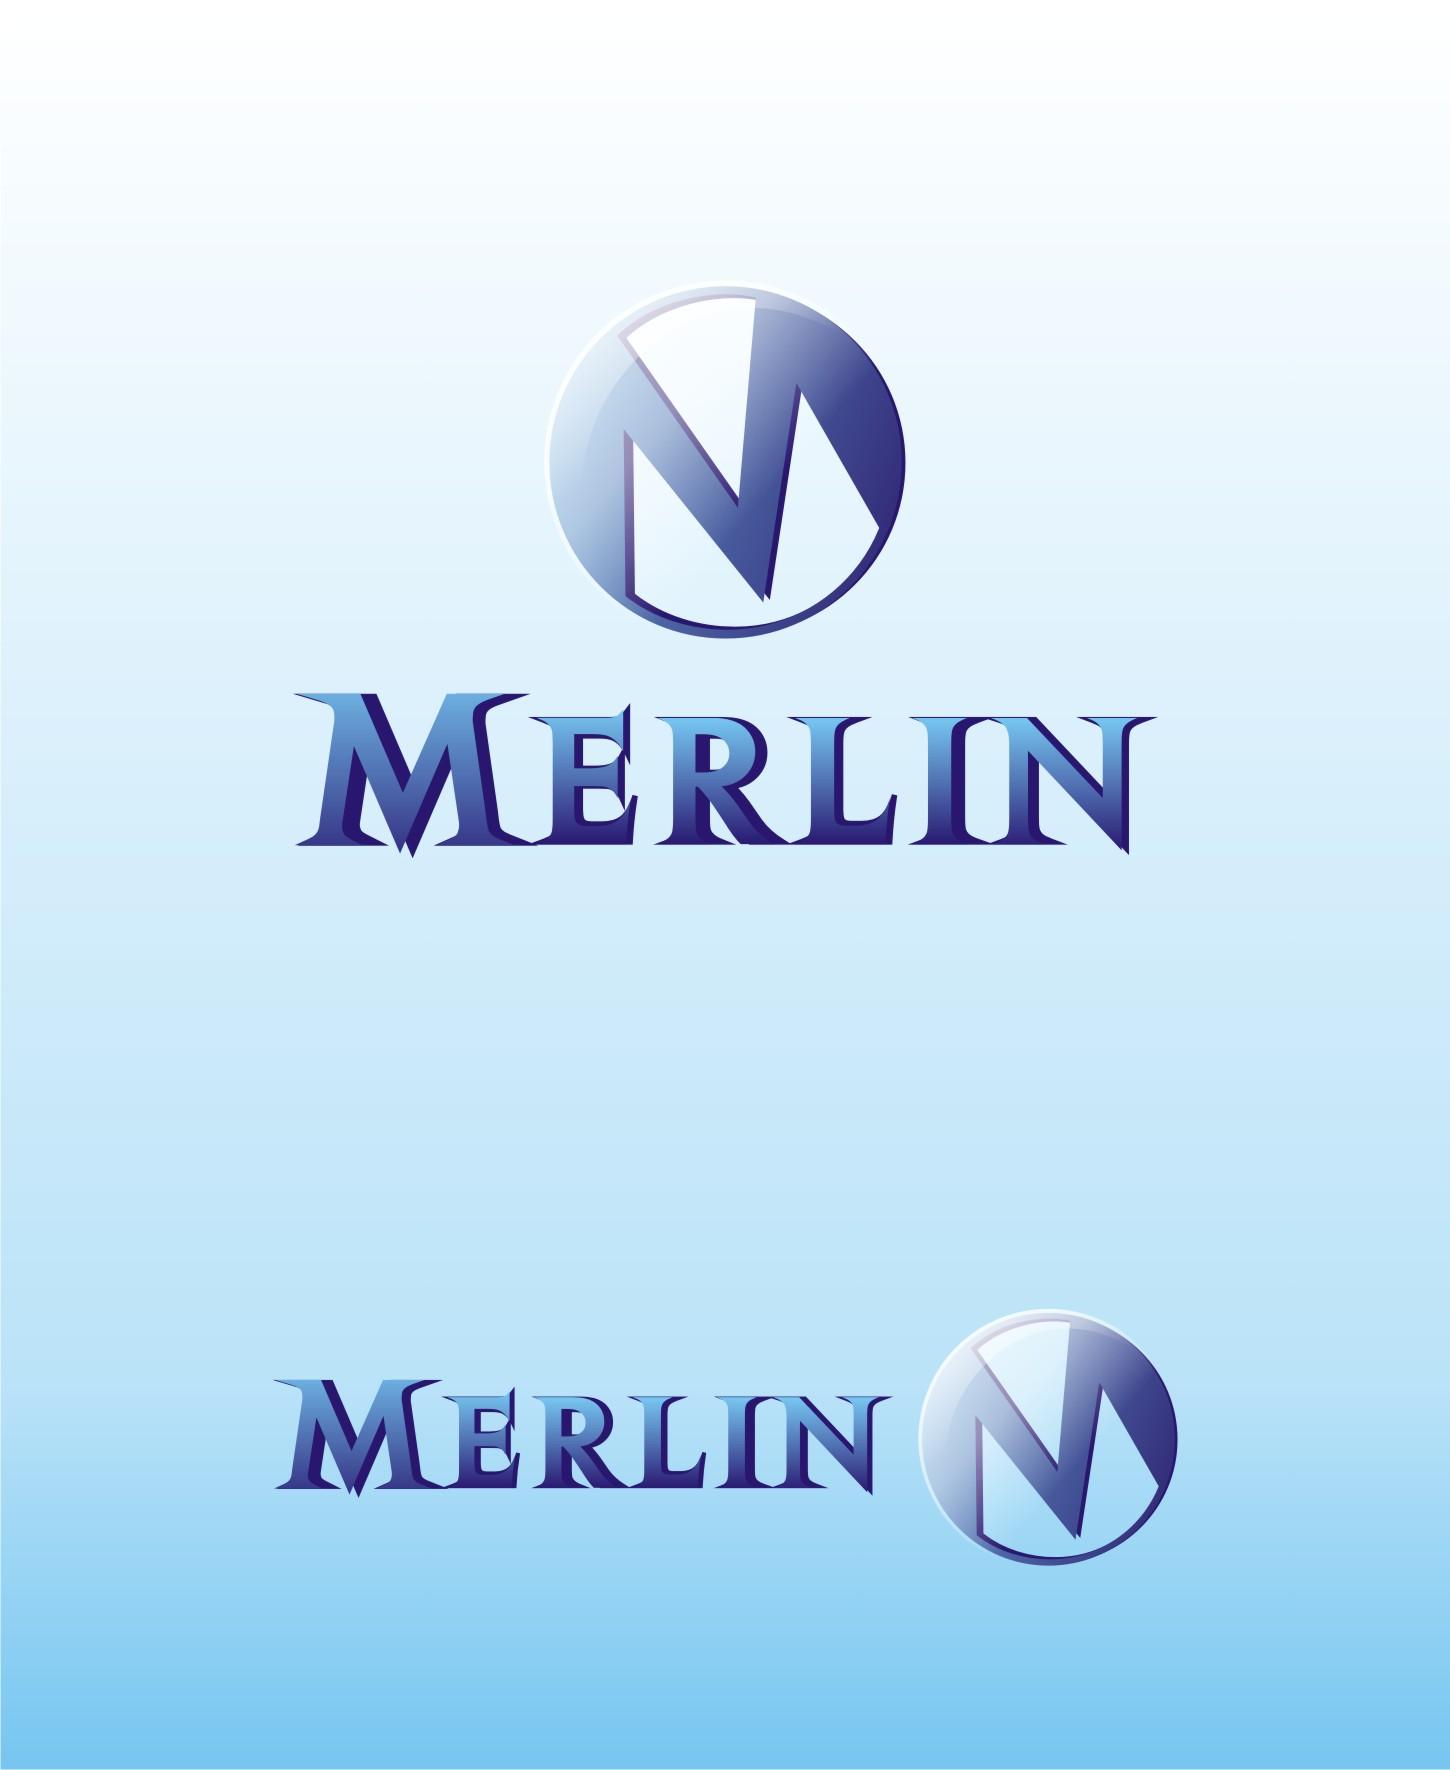 Logo Design by Private User - Entry No. 54 in the Logo Design Contest Imaginative Logo Design for Merlin.